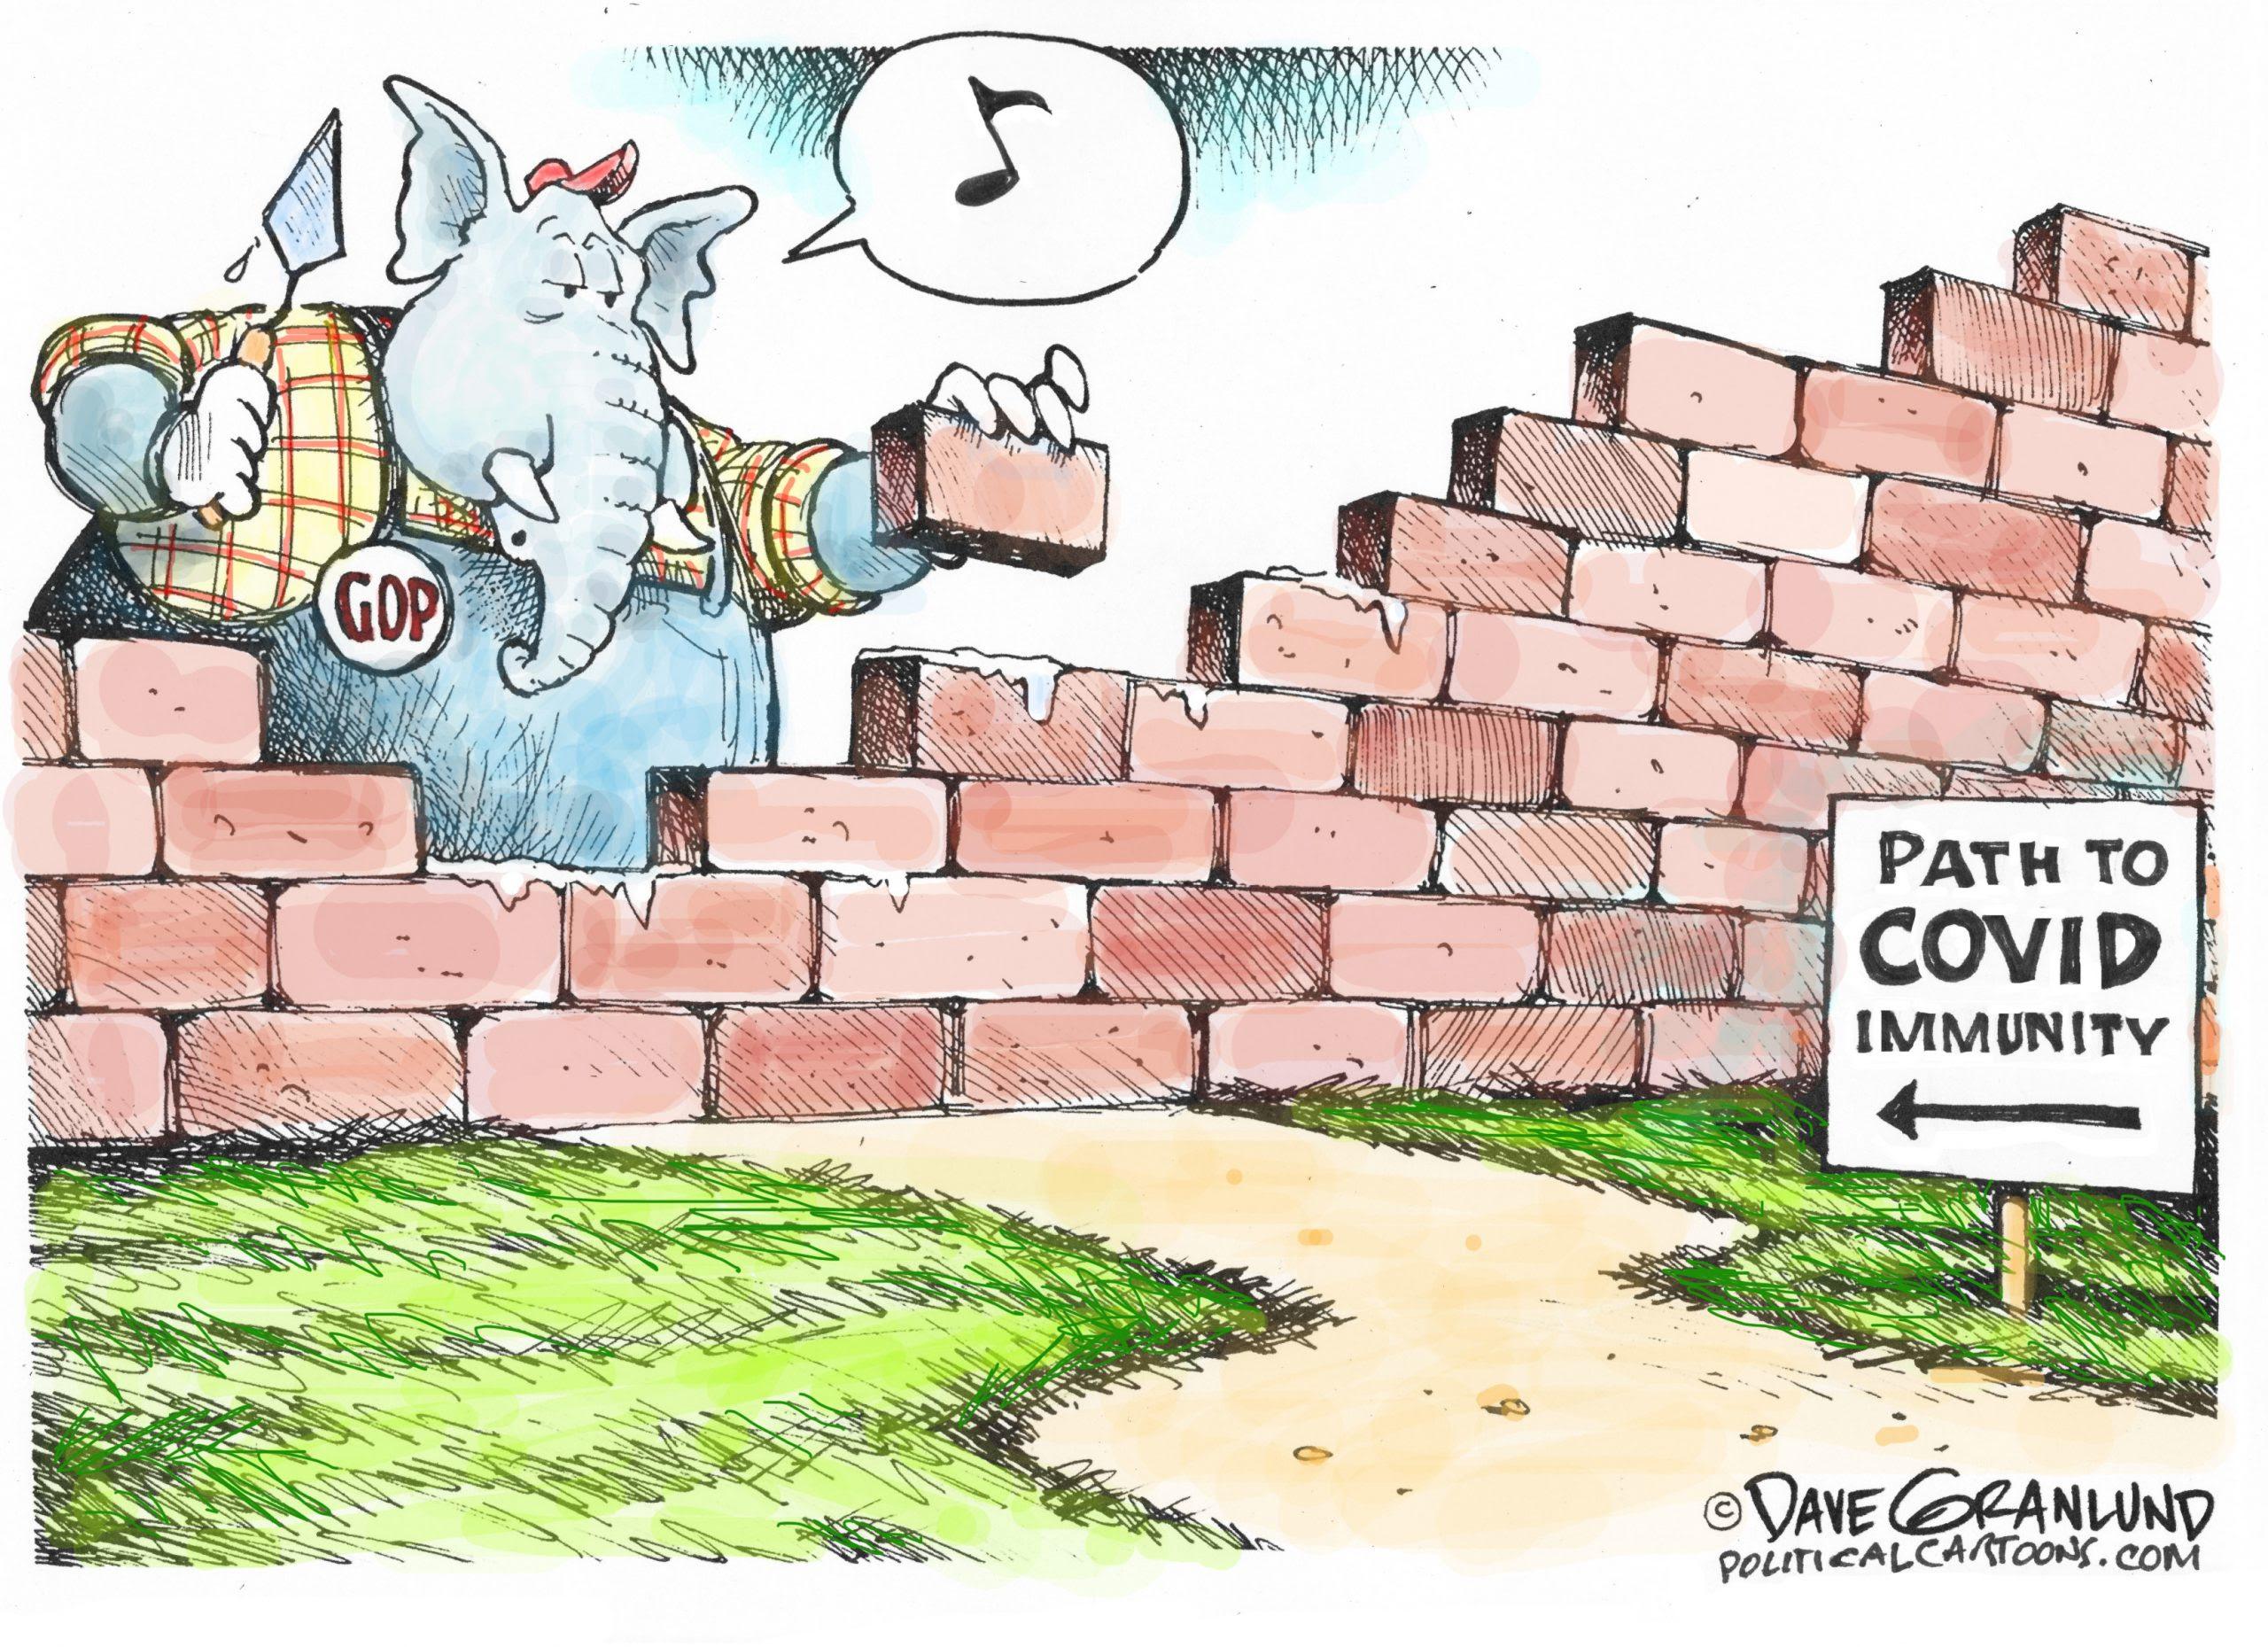 Republicans block path to COVID immunity